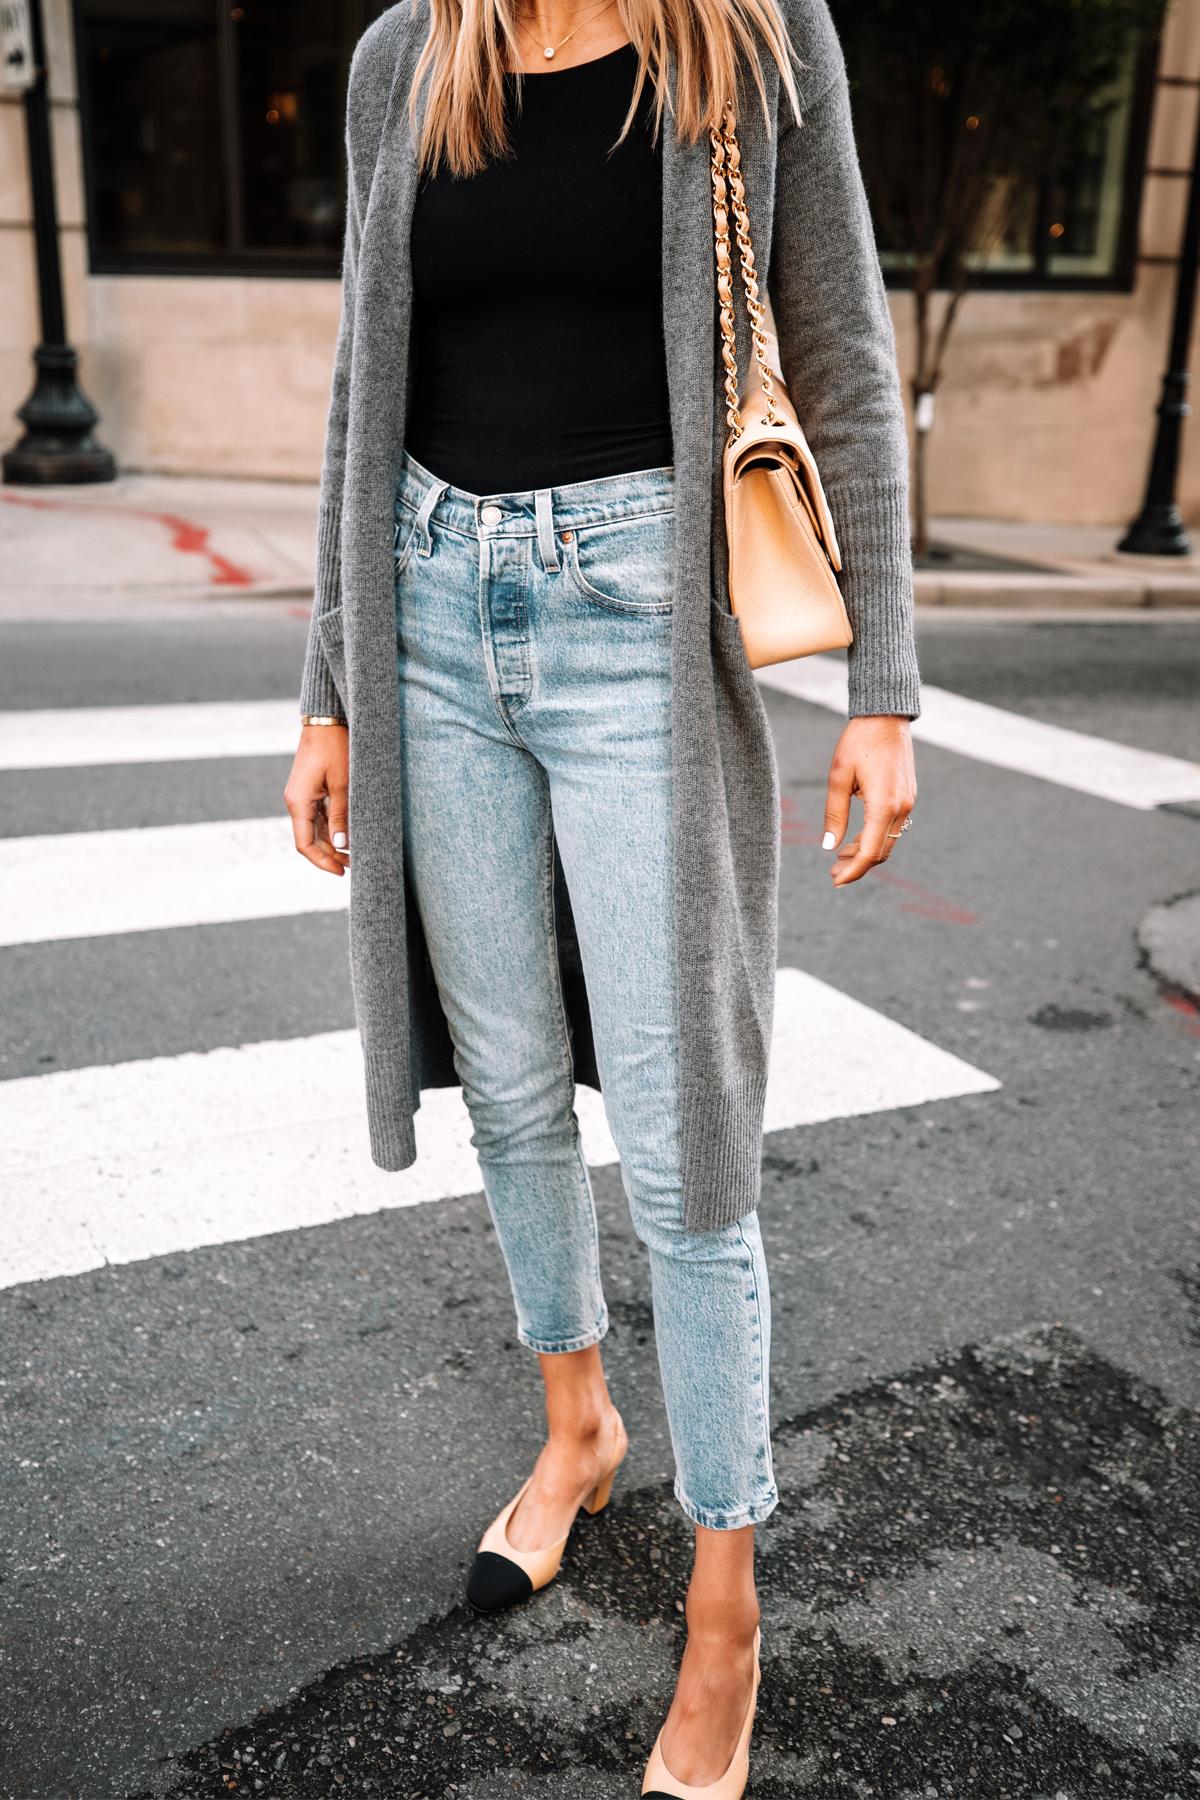 Fashion Jackson Wearing Long Grey Cardigan Black Bodysuit Levis 501 Jeans Chanel Slingbacks 2